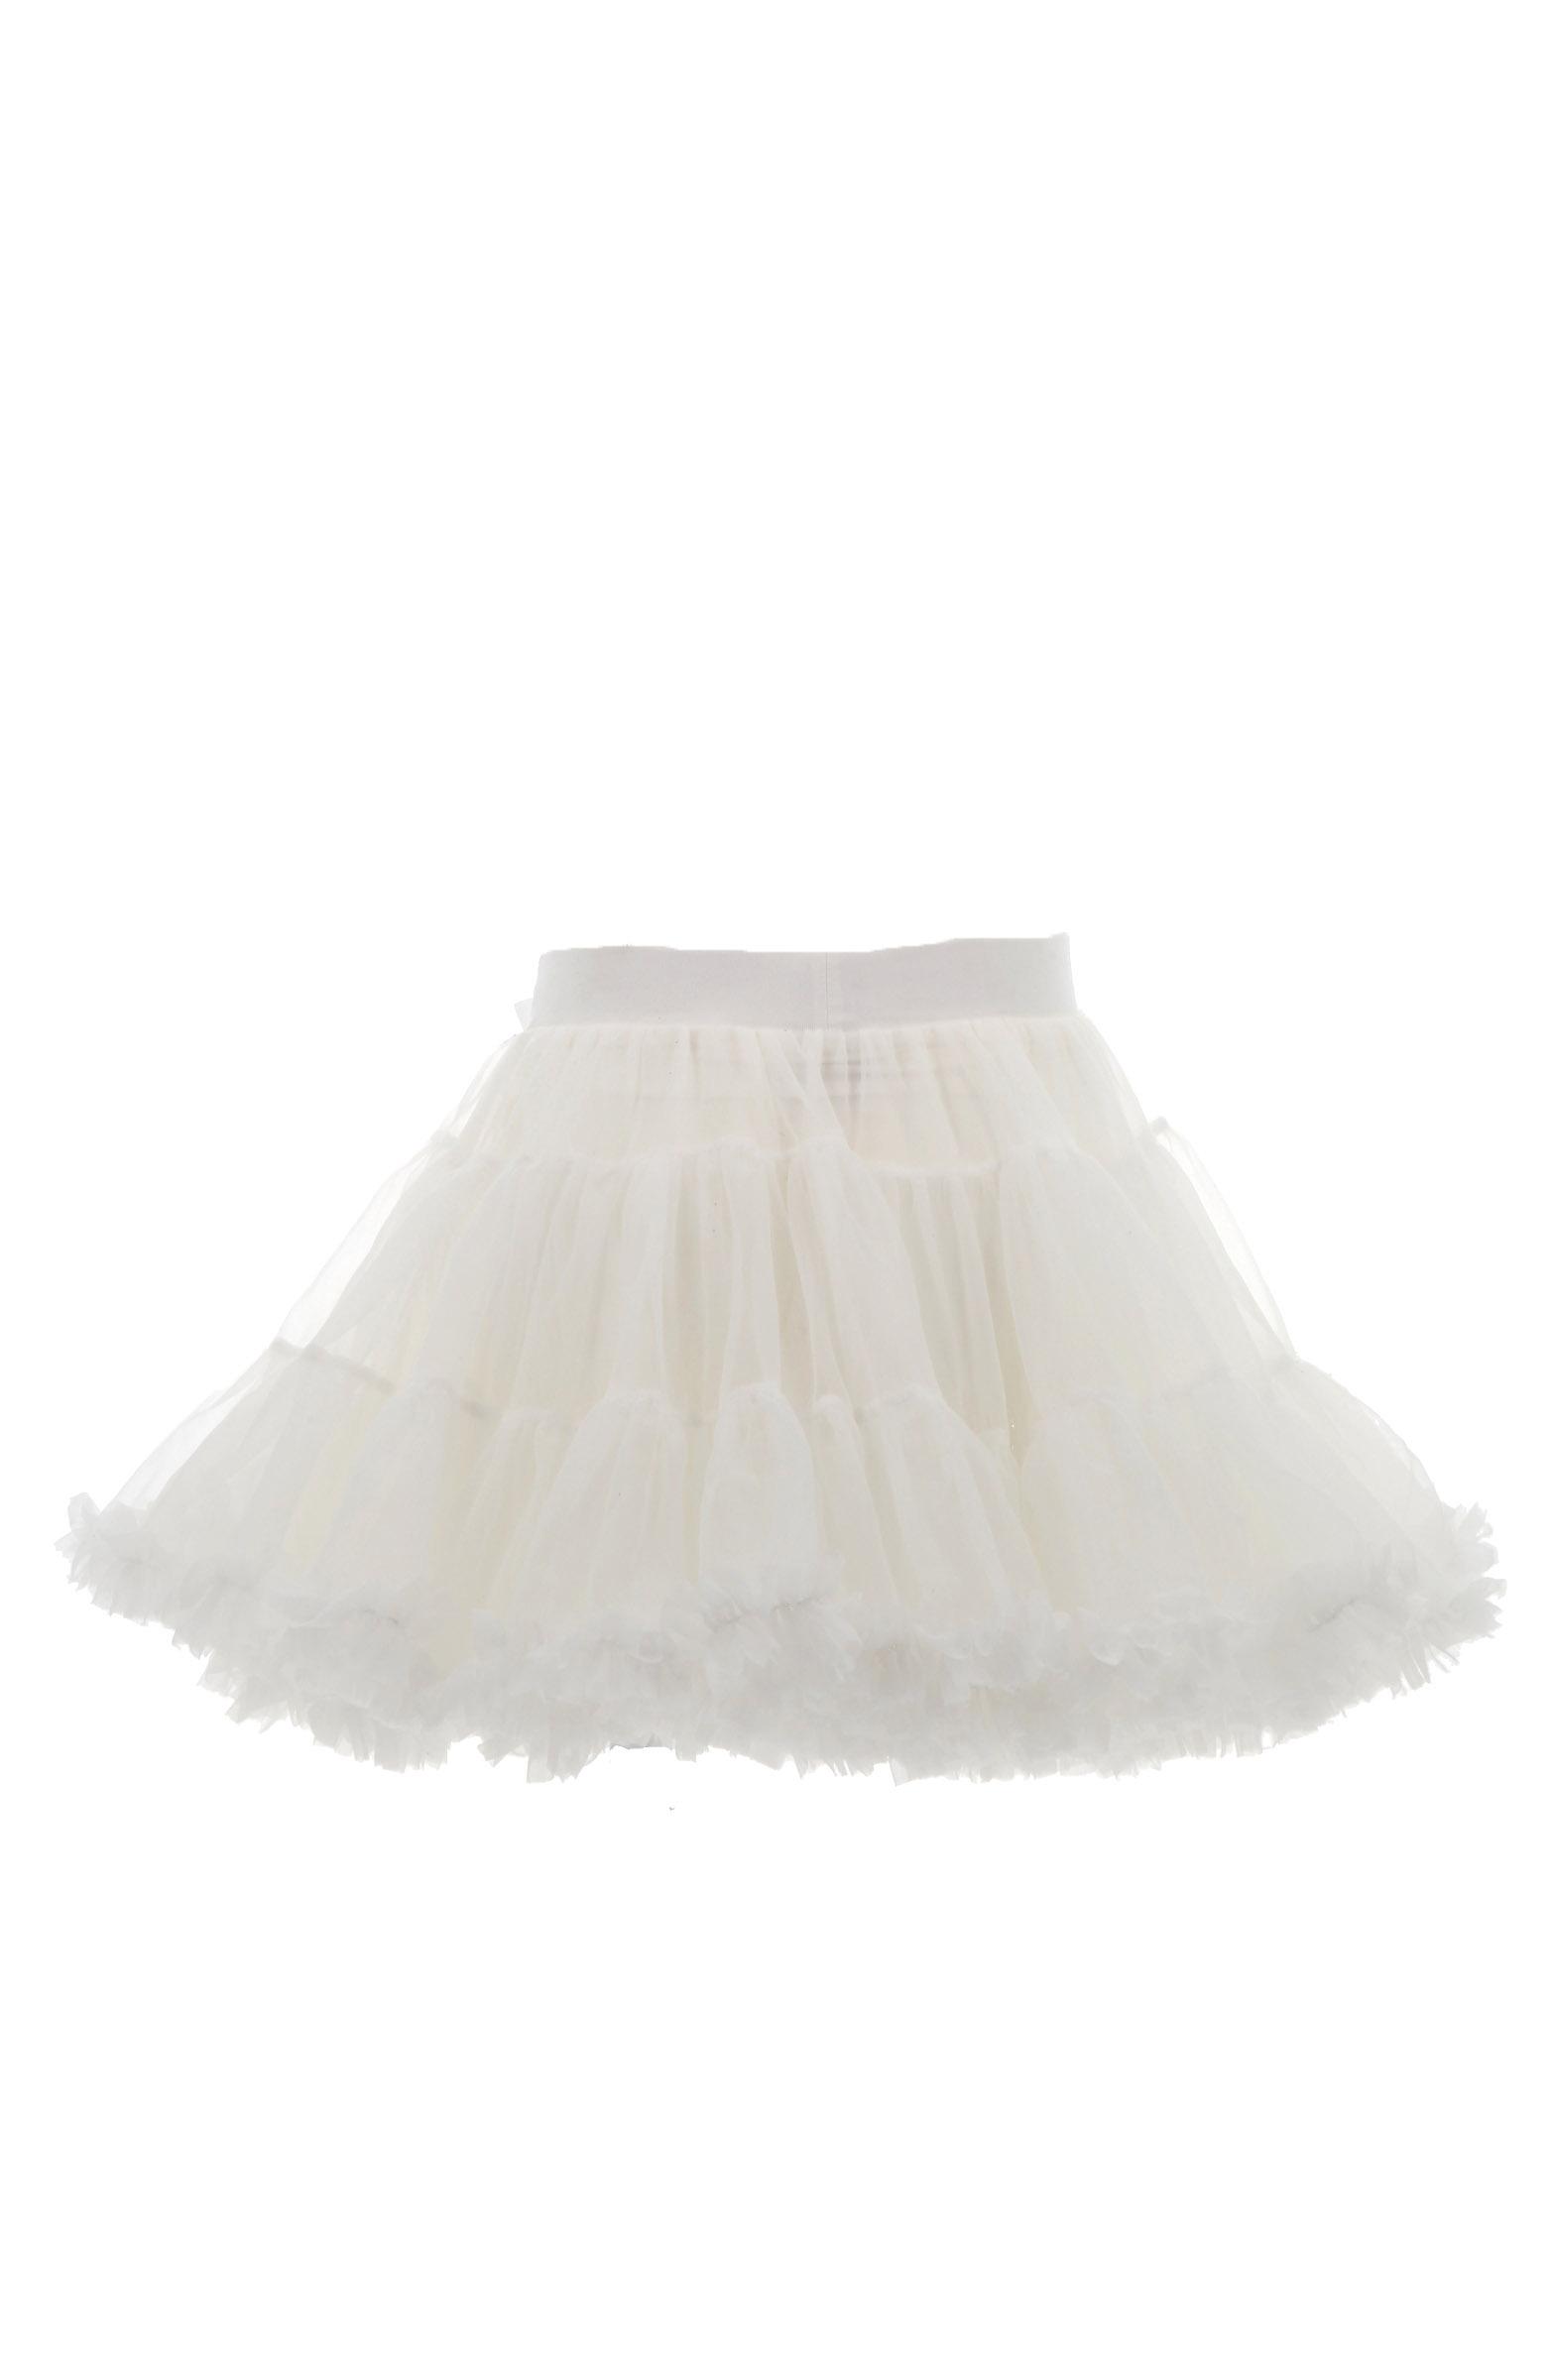 Tulle skirt Angel's Face | Skirt | PIXIESNOWDROP